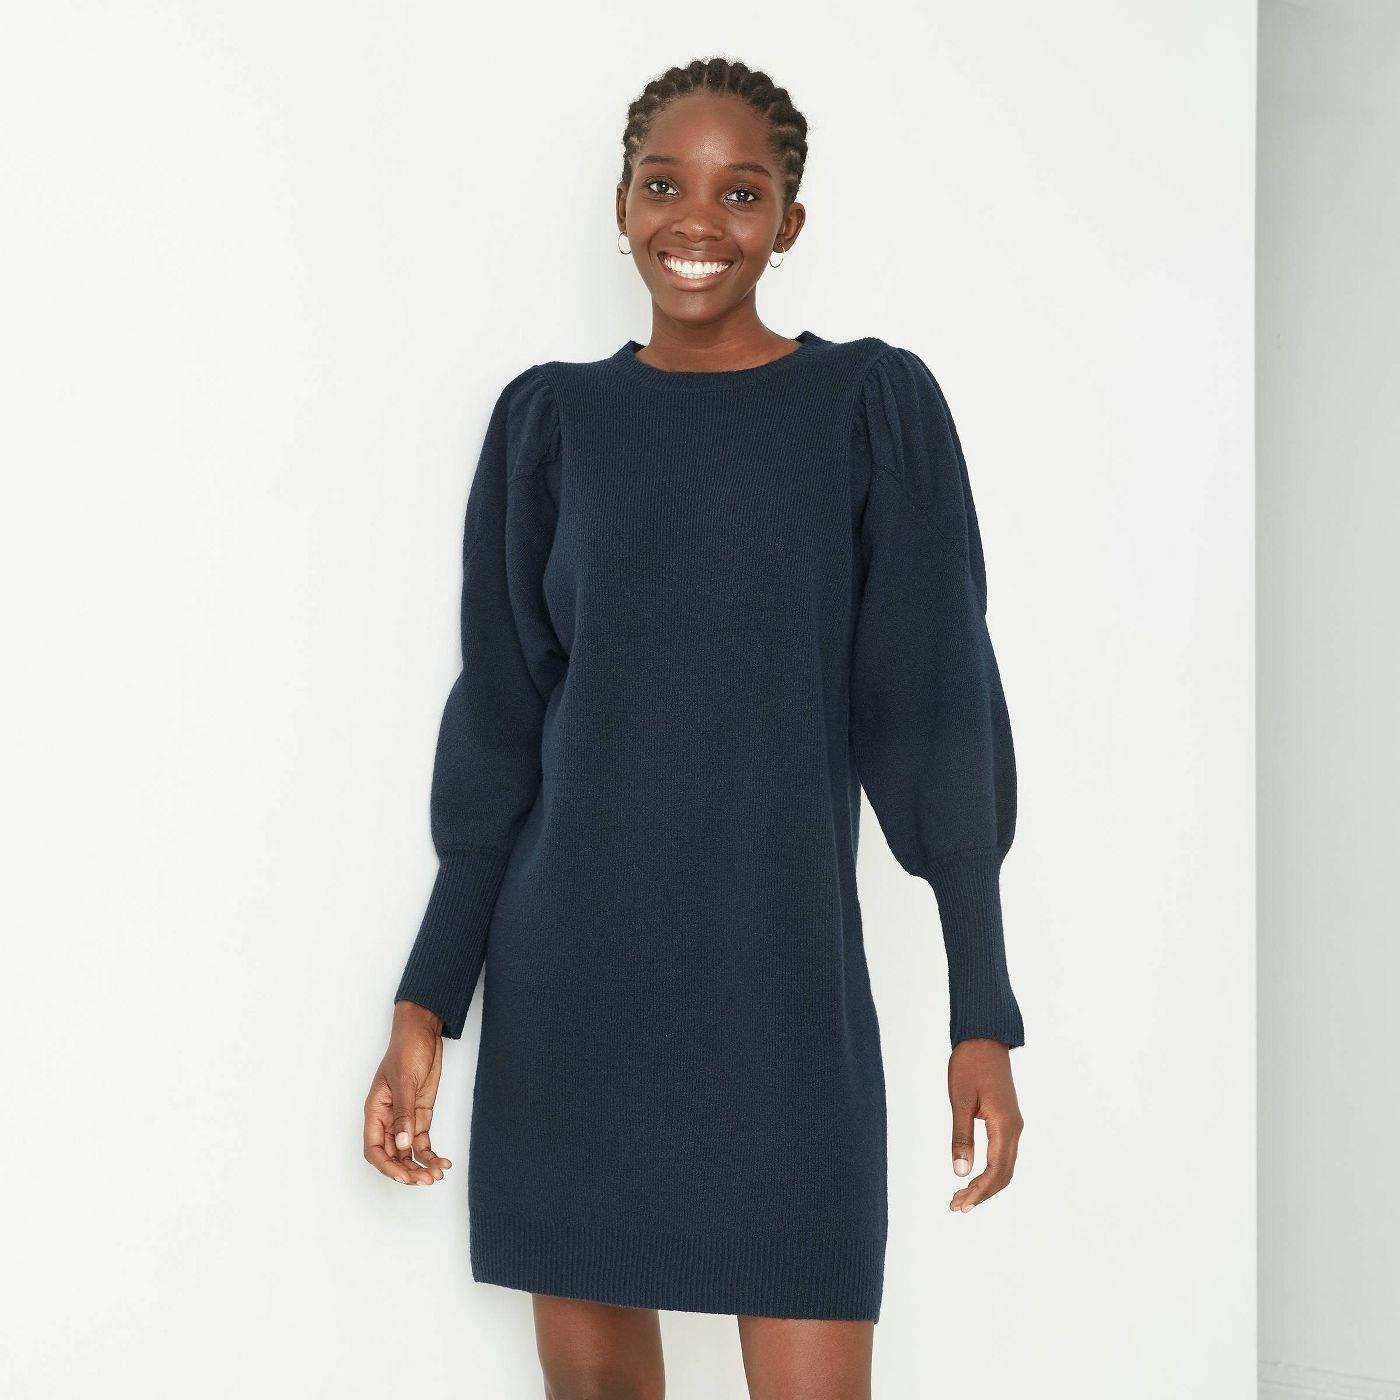 Model wearing the navy sweater dress